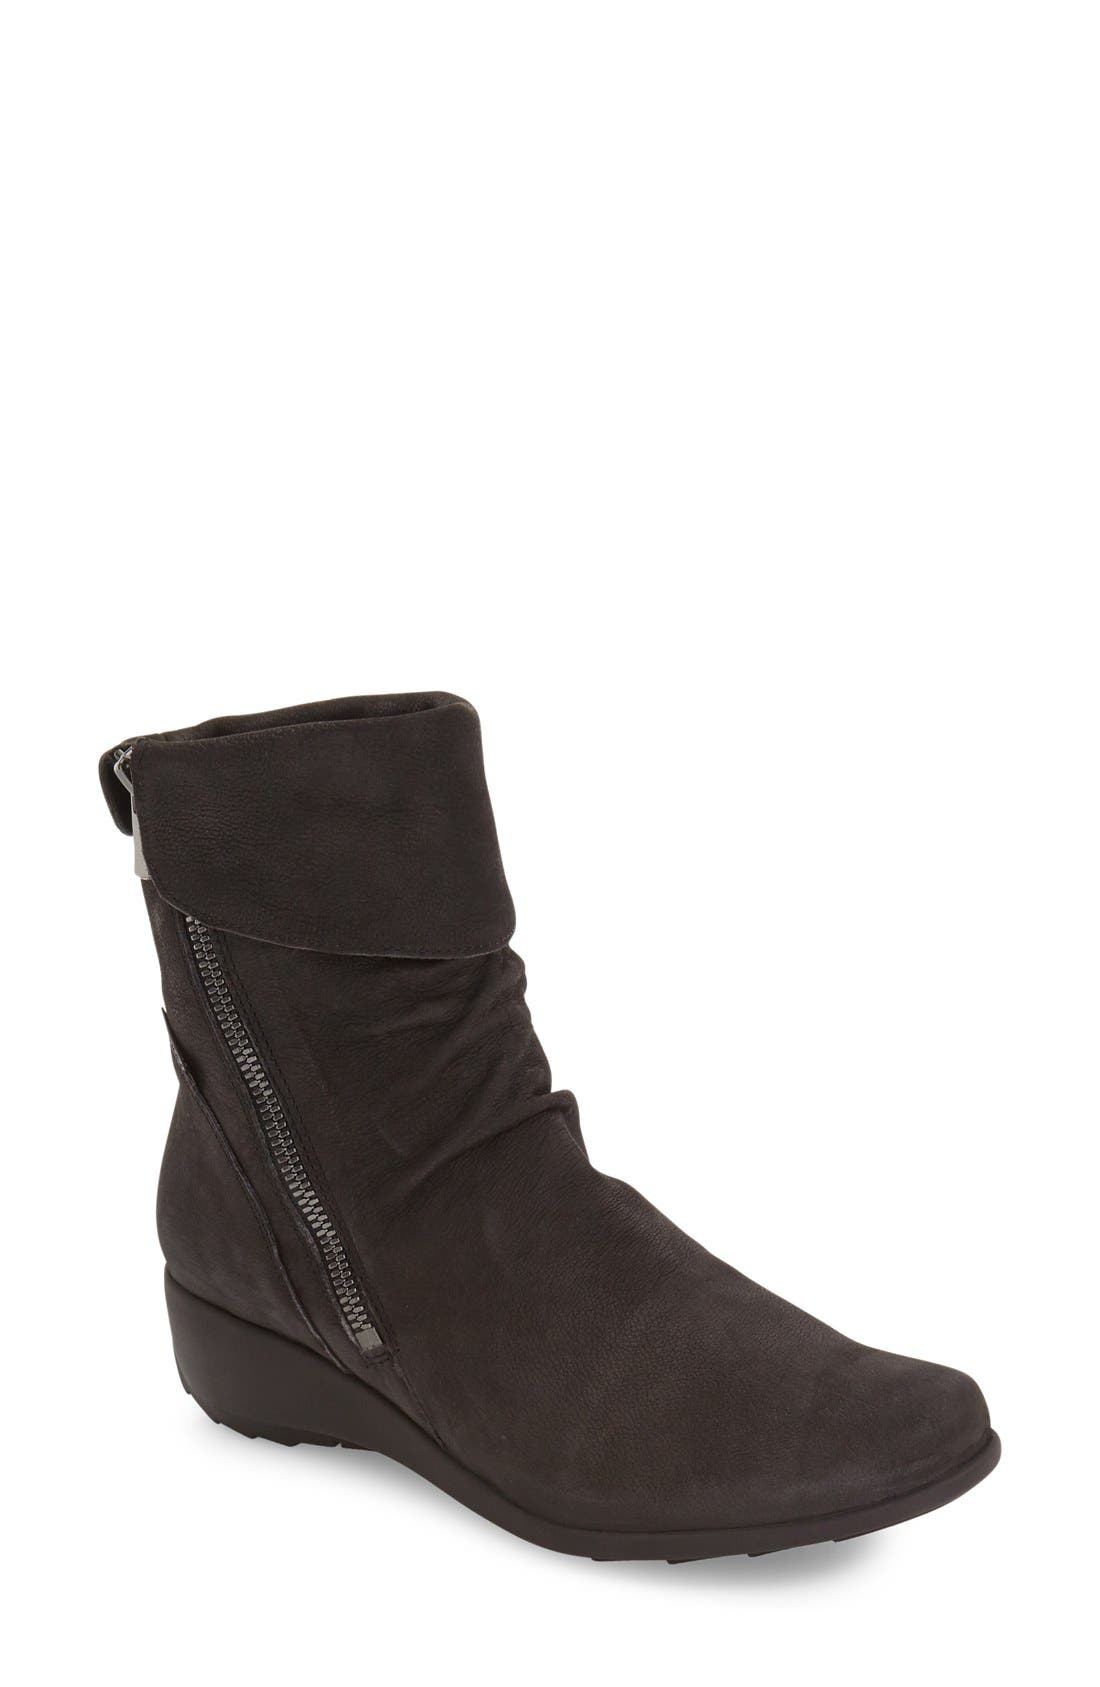 Mephisto Sale Women S Shoes